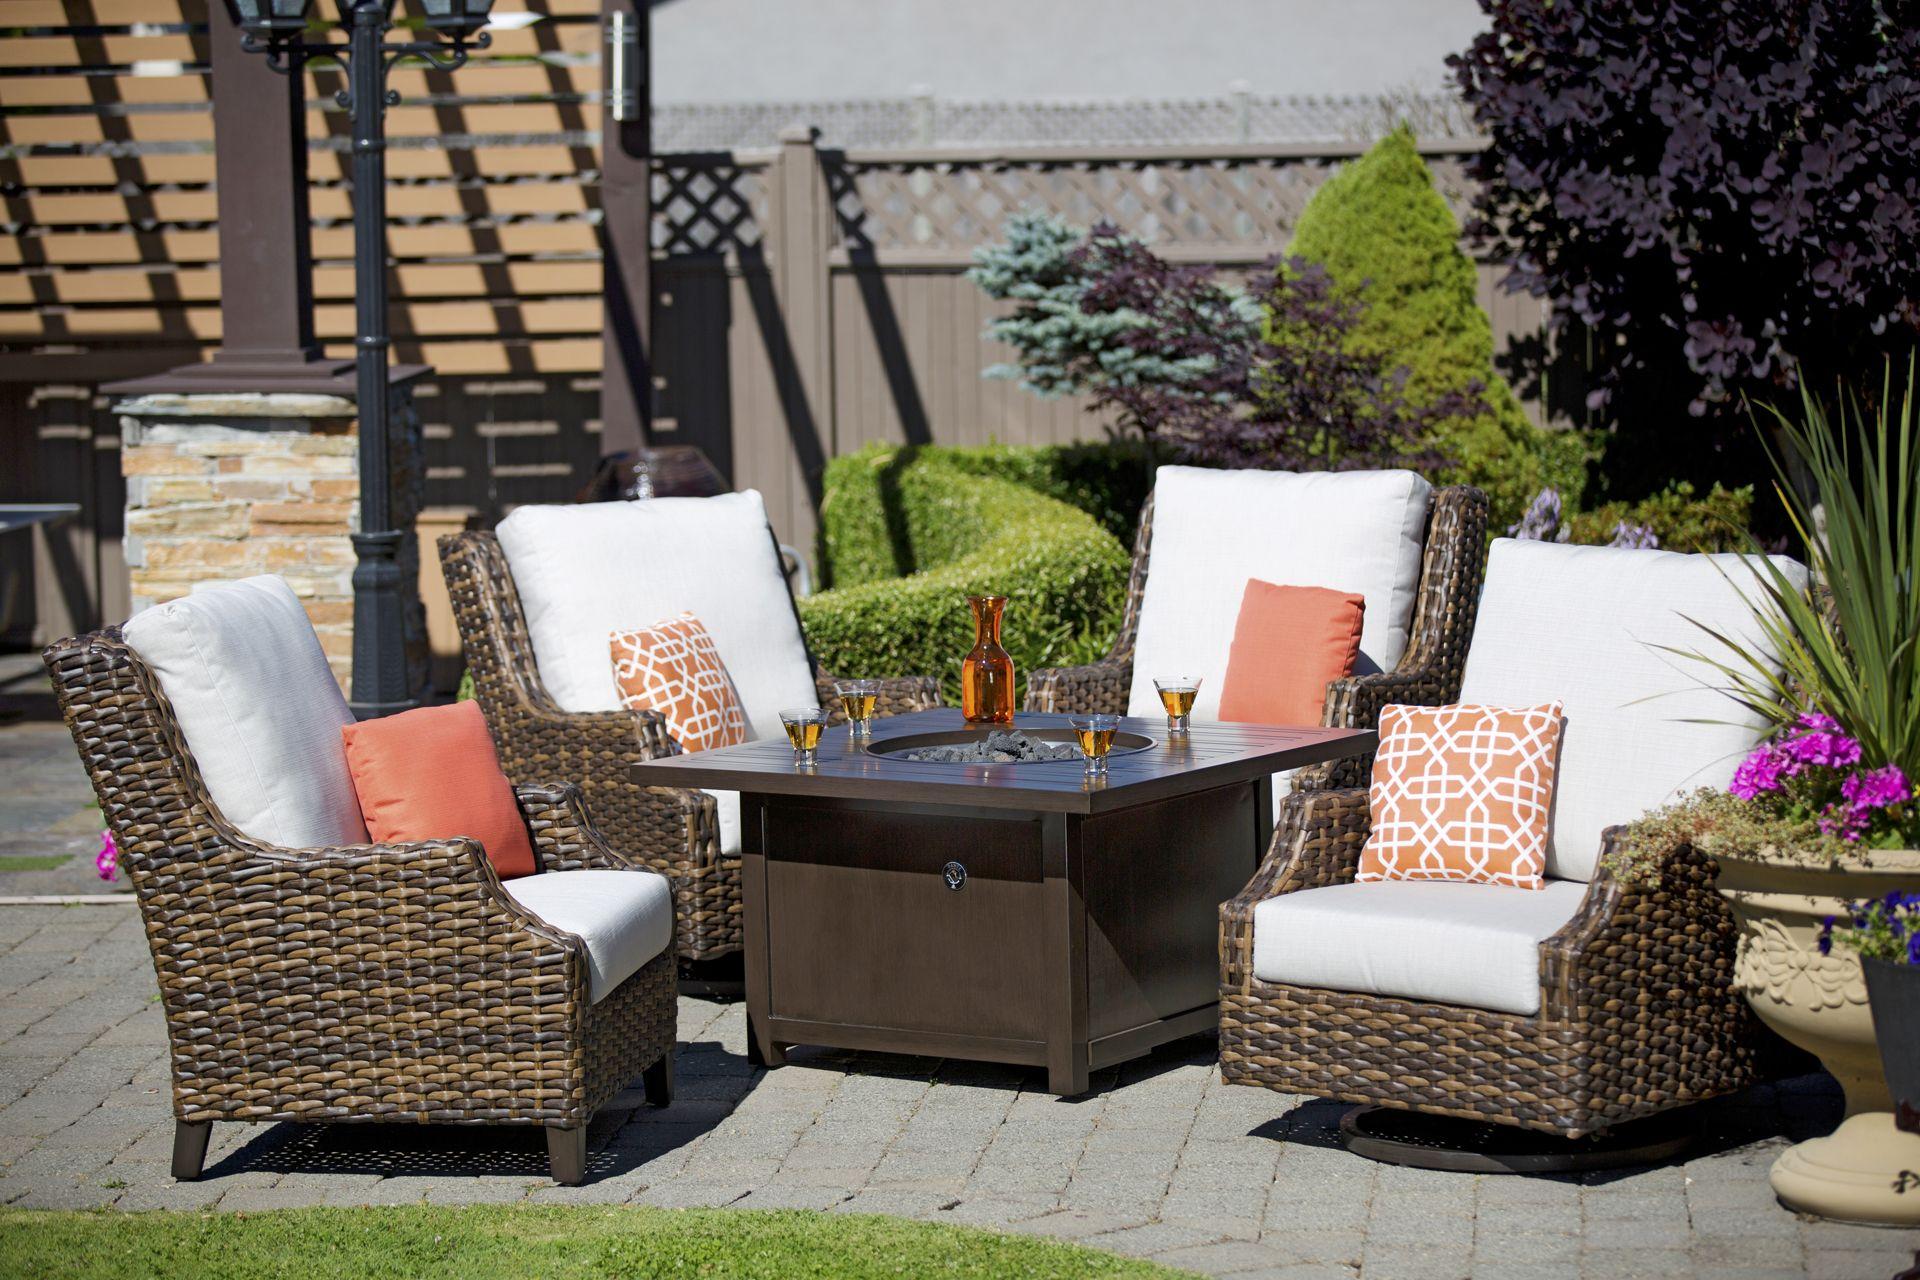 Wwwratanacom Firepit Pinterest Patios - Ratana outdoor furniture